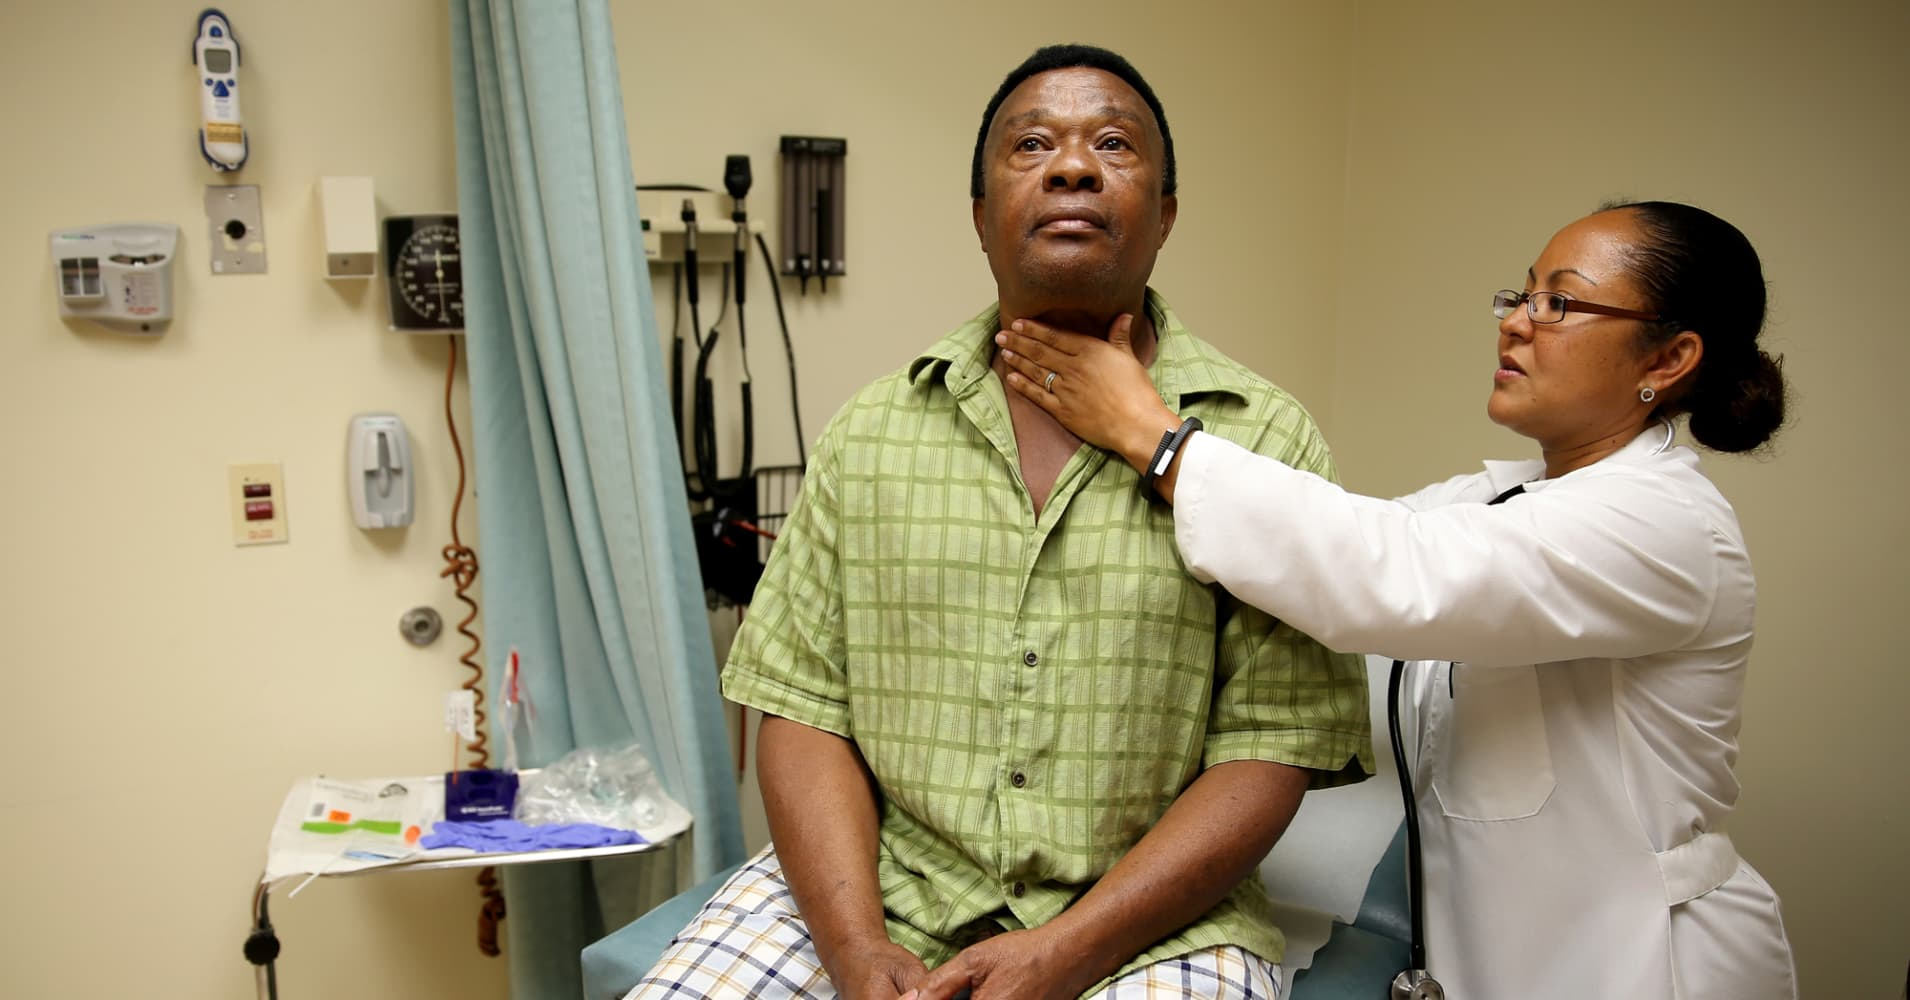 CBO releases new estimates on Obamacare repeal bill; 23 million would lose insurance coverage